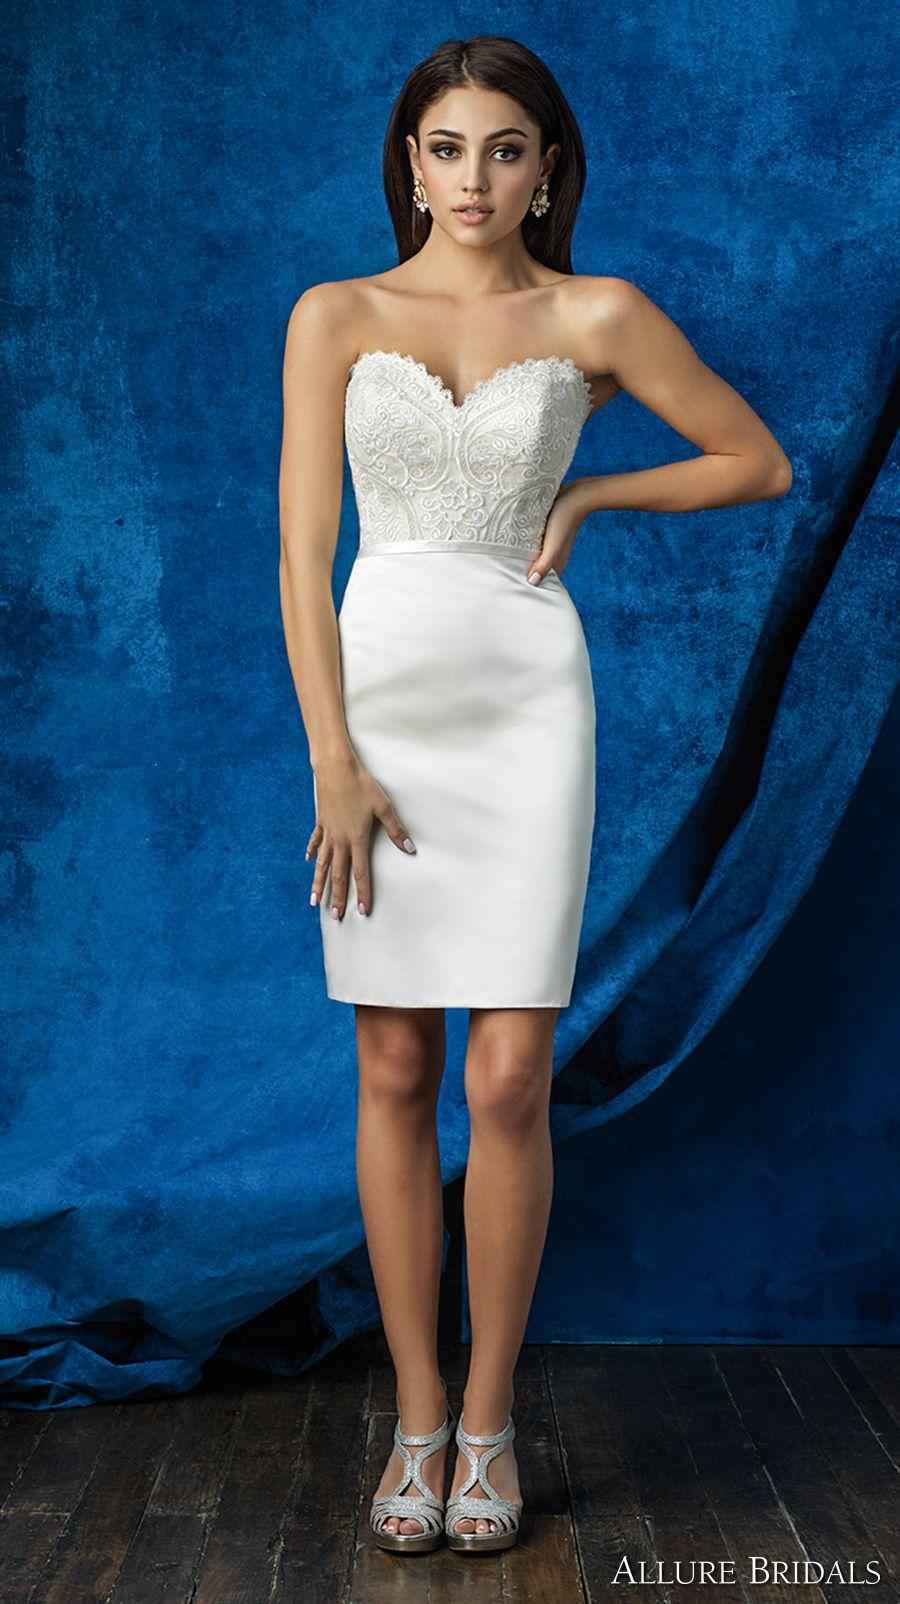 876b49c622b ALLURE BRIDALS 2016 mix match strapless scallop sweetheart neckline heavily  embellished bodice satin short skirt above the knee short wedding dress  (a2001 ...